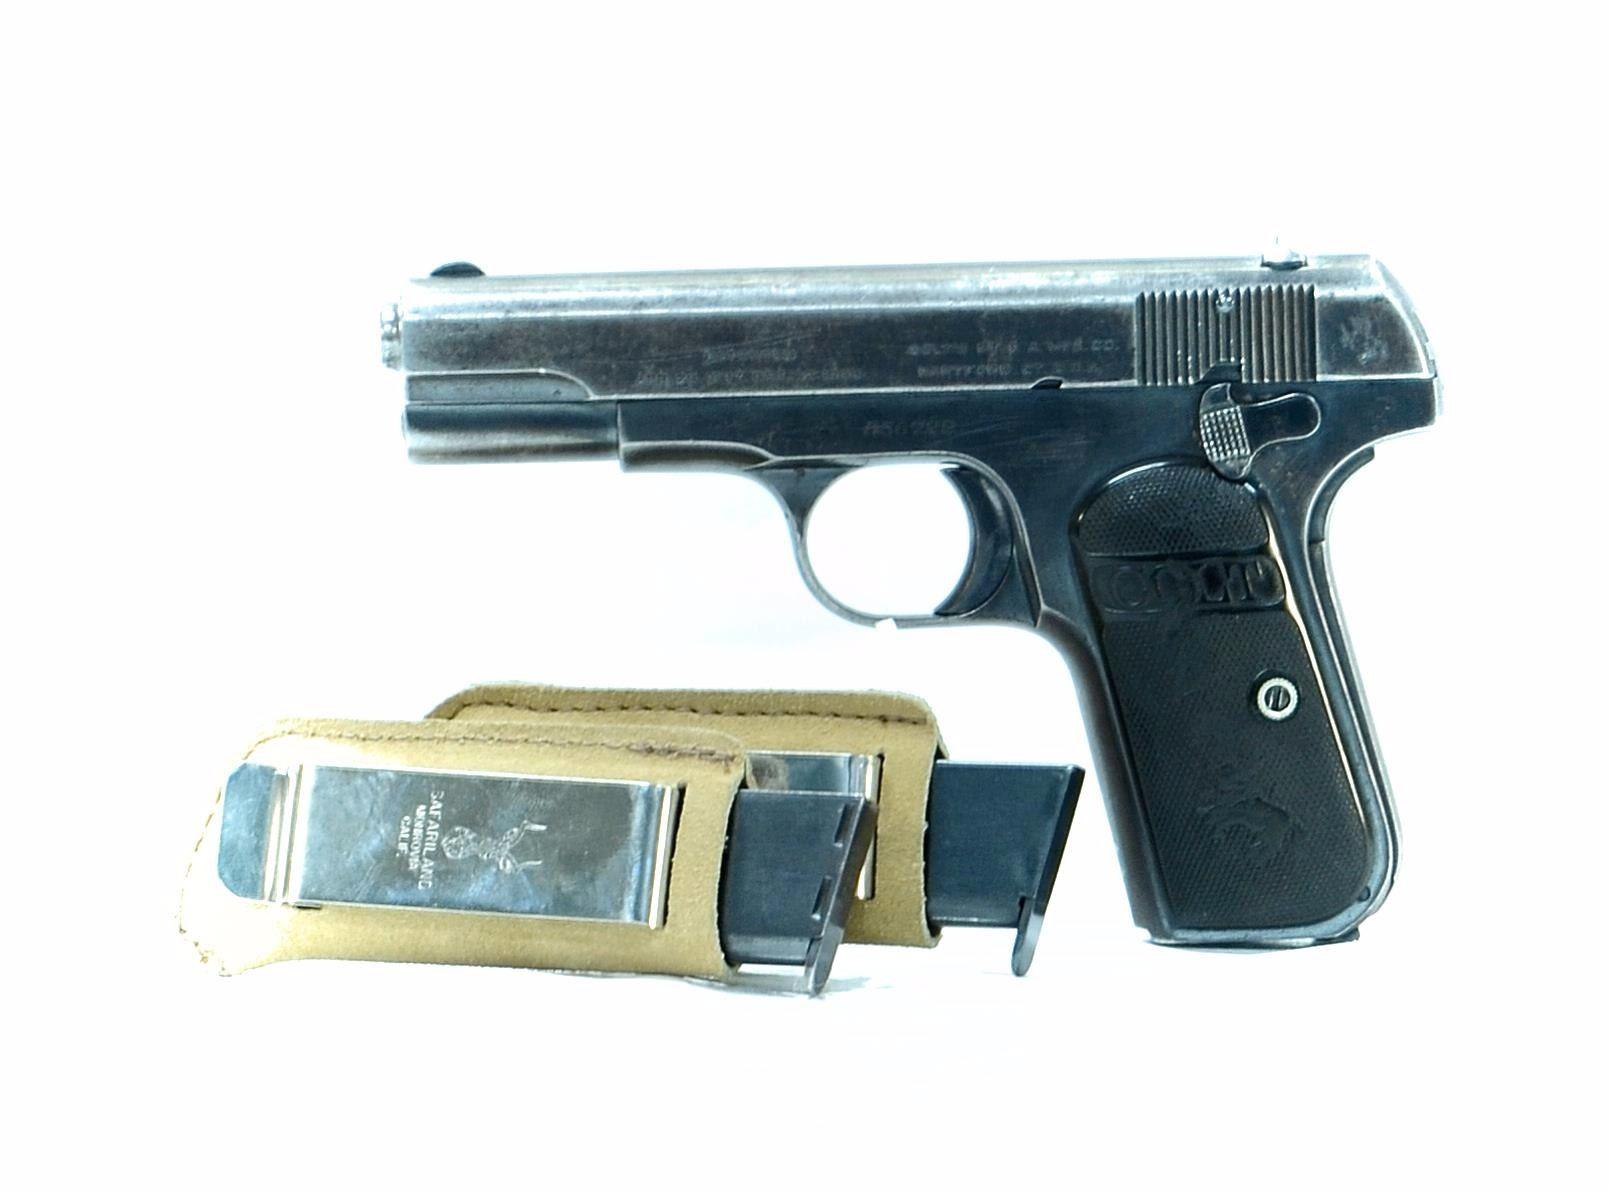 COLT 1903- CAL  32 RIM LESS *THIS IS A PROHIBITED HANDGUN*